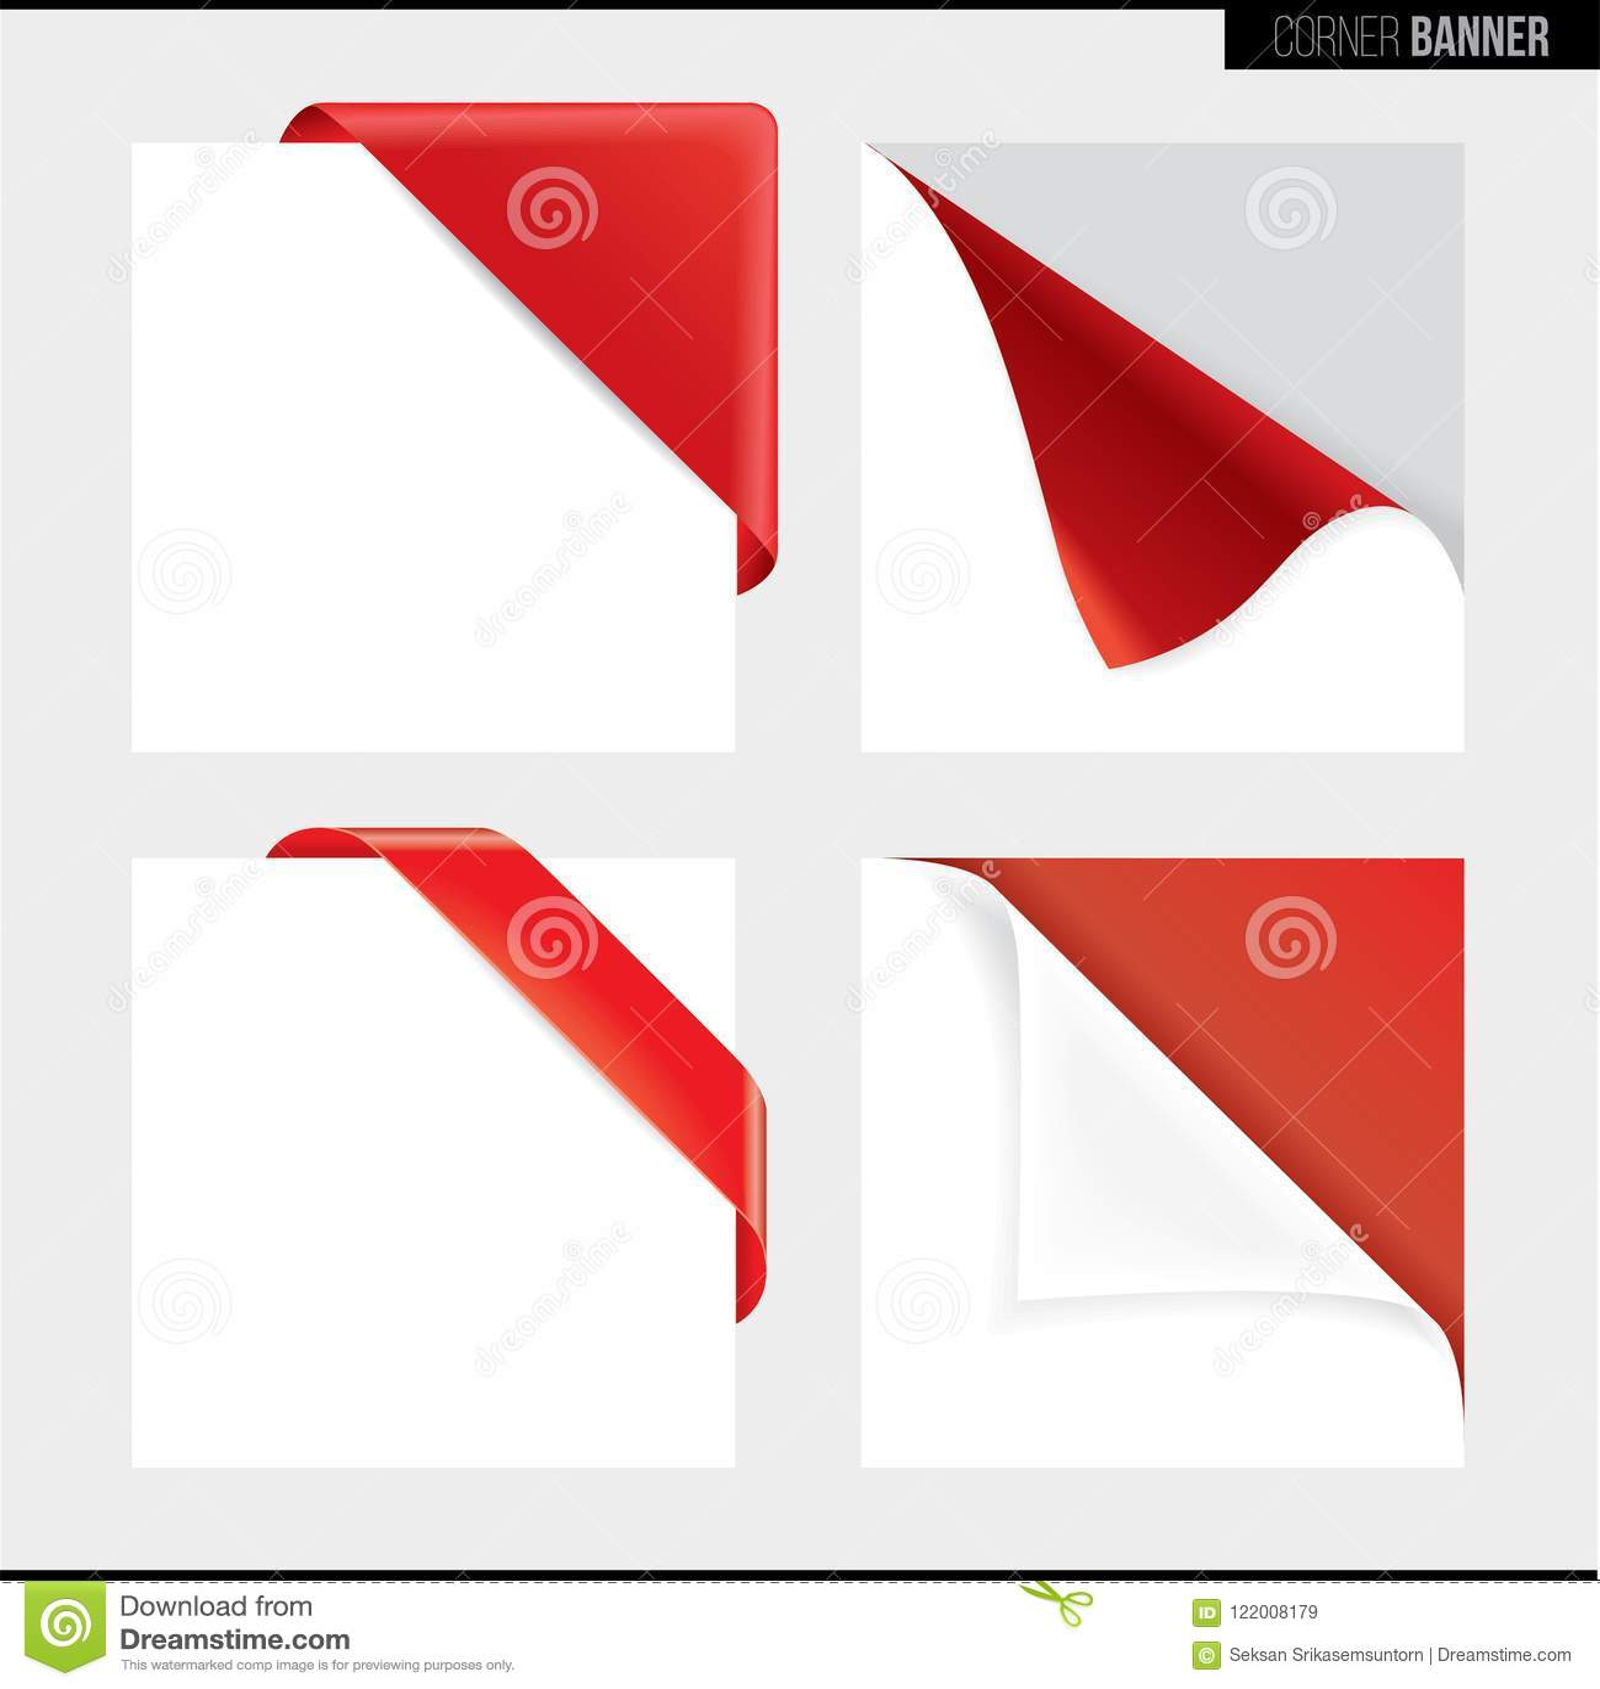 La bandera de la esquina del color verde, vector illustrationRed la bandera de la esquina del color, ejemplo del vector